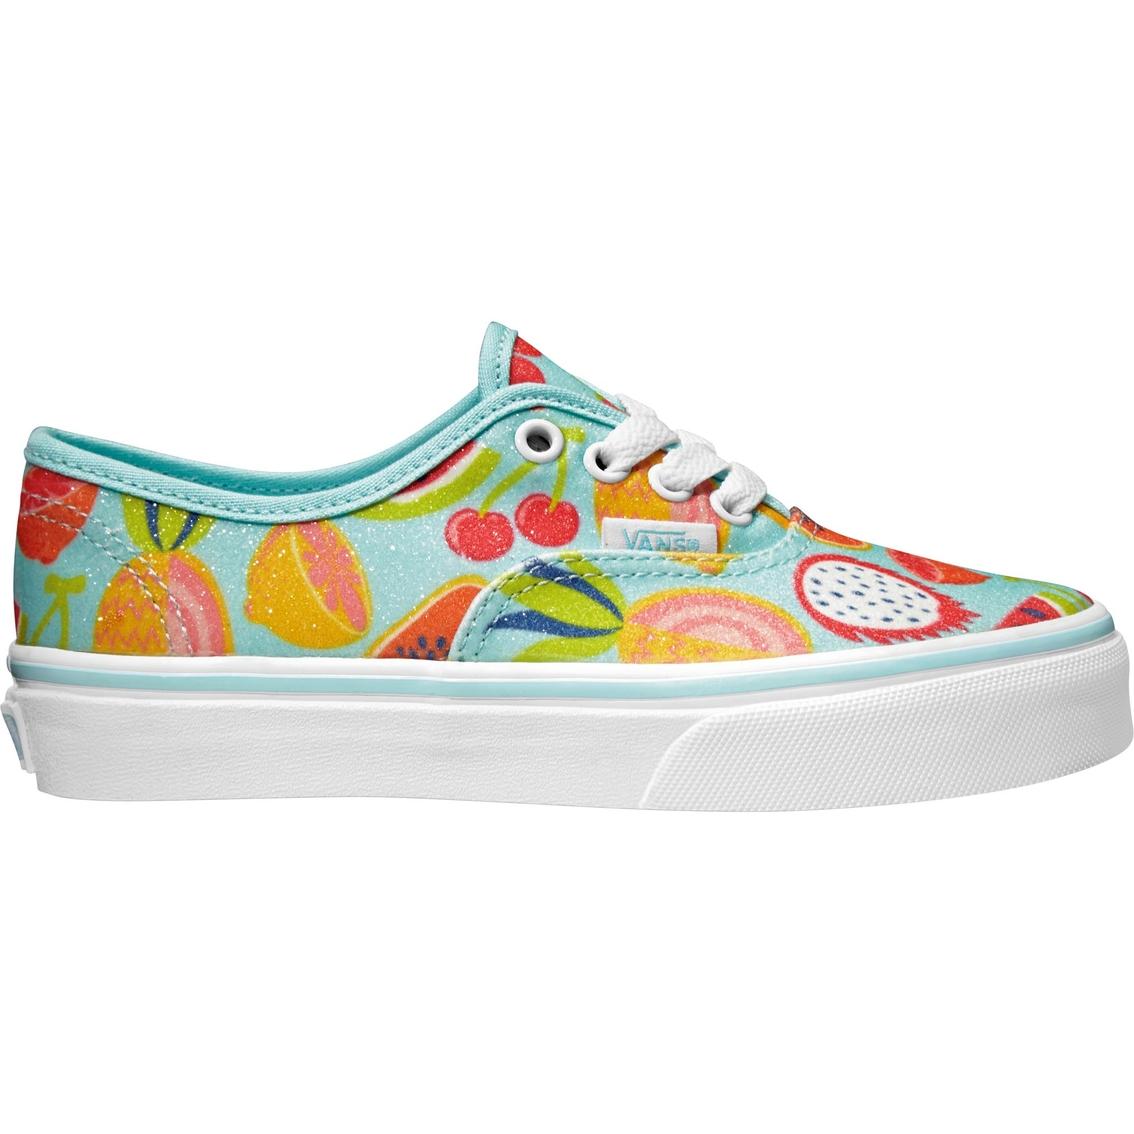 5051fa768f Vans Girls Authentic Mint Fruit Sneakers